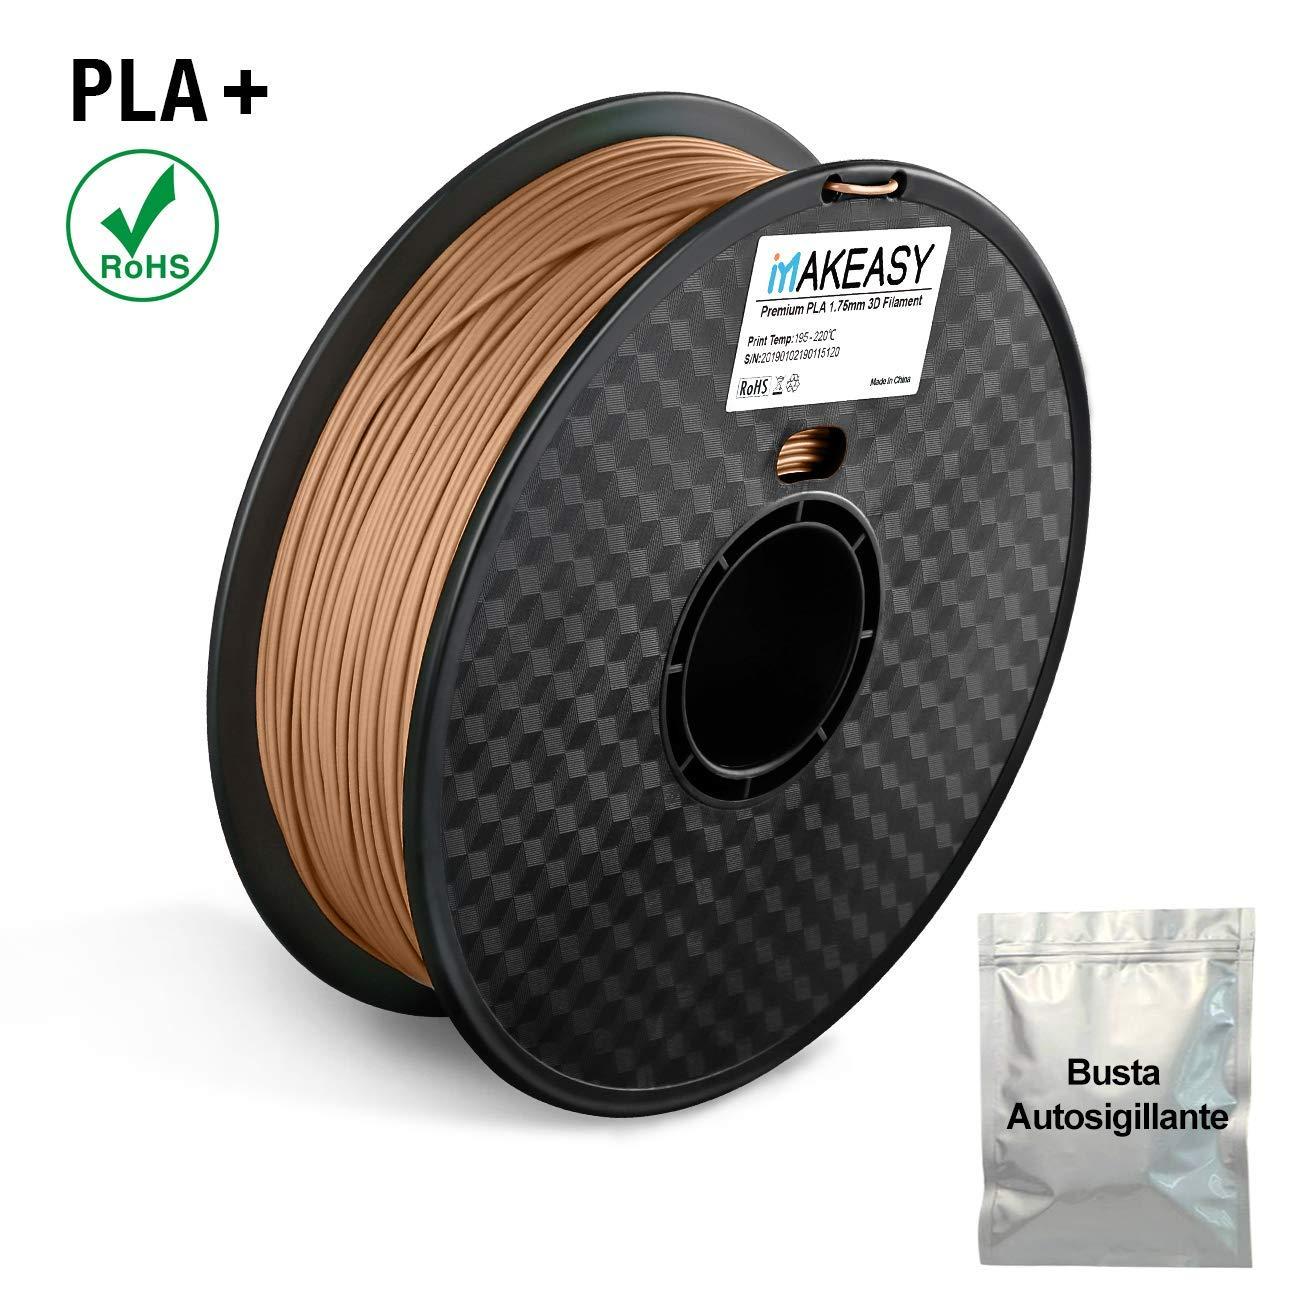 Filamento de 1,75 mm PLA+ MAKEASY para impresora 3D 1 kg Spool 3D ...